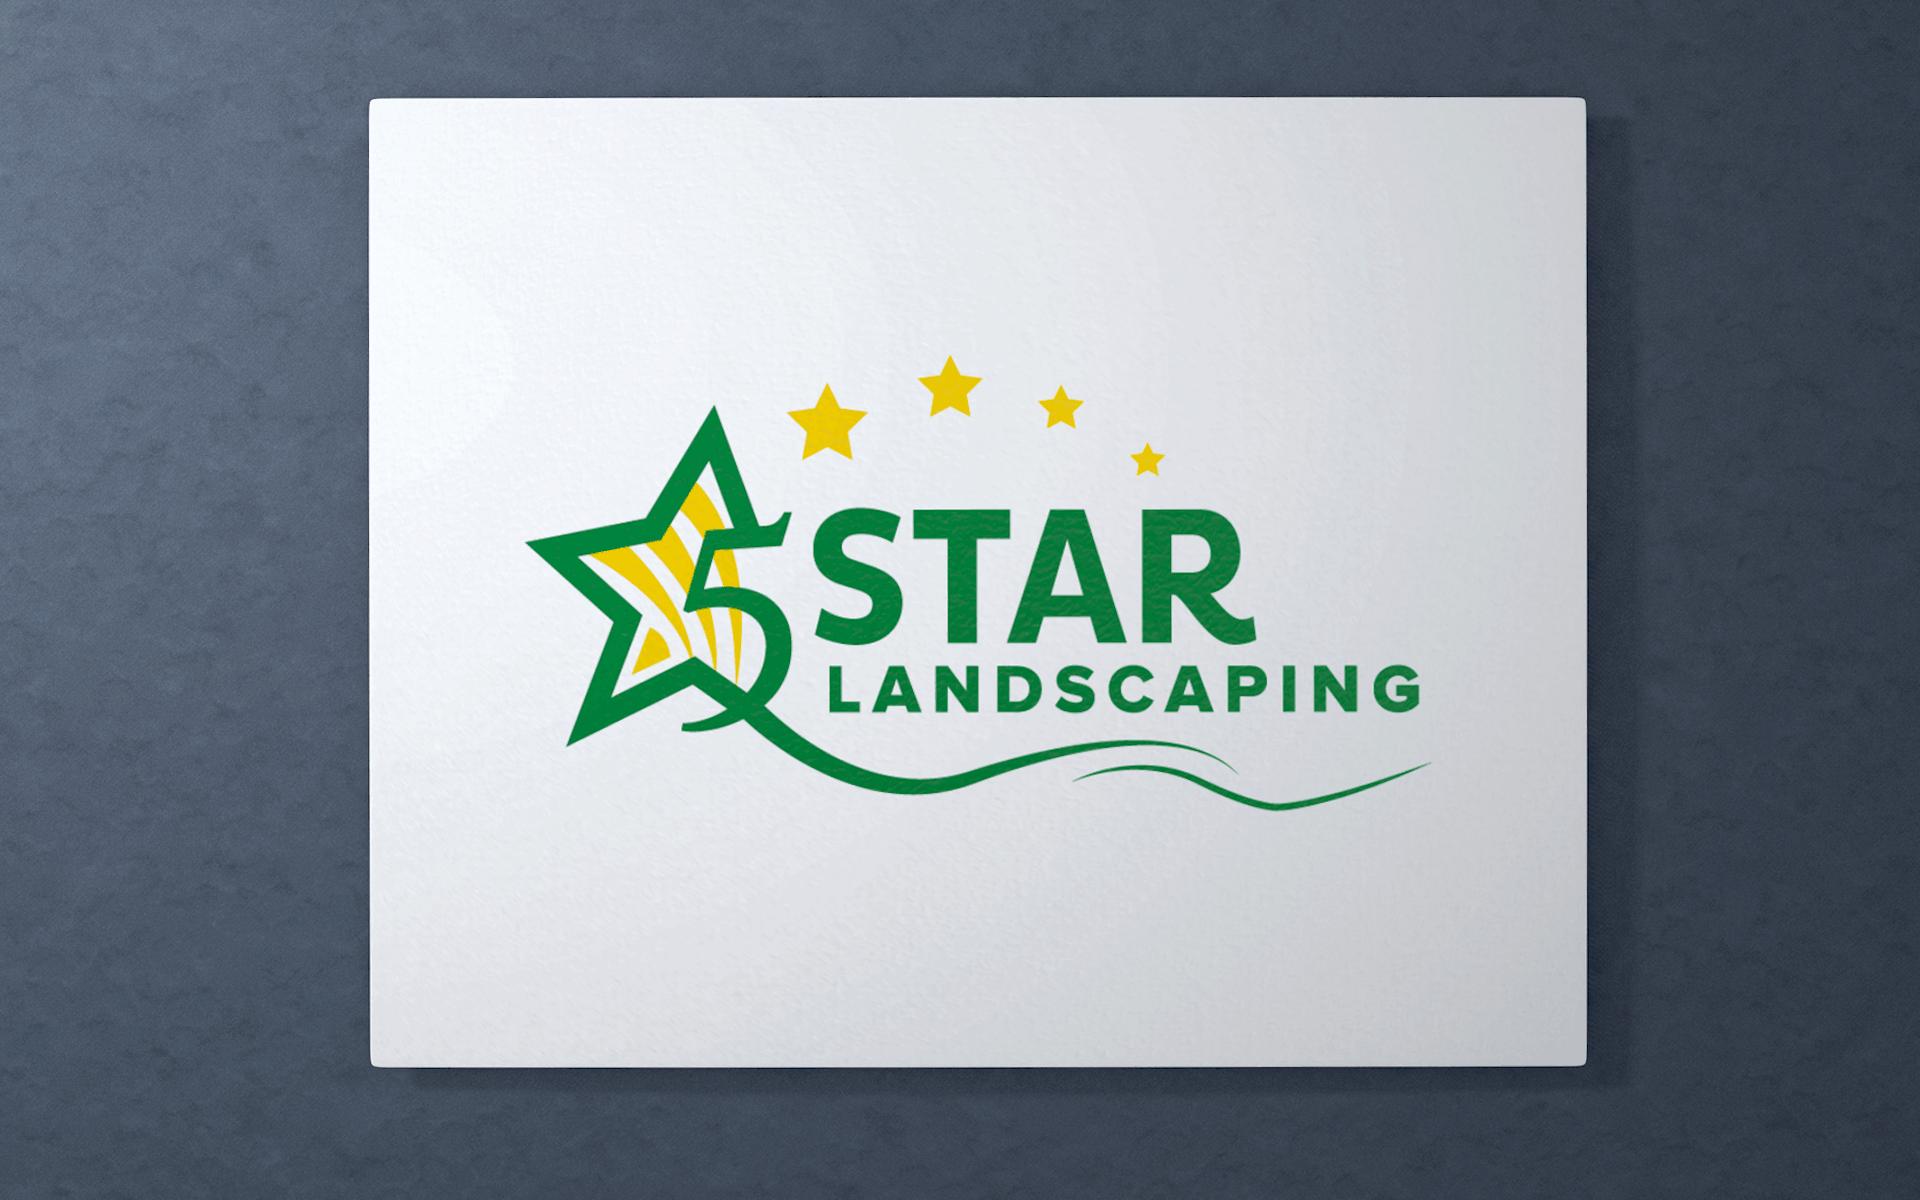 5STAR LANDSCAPING LOGO